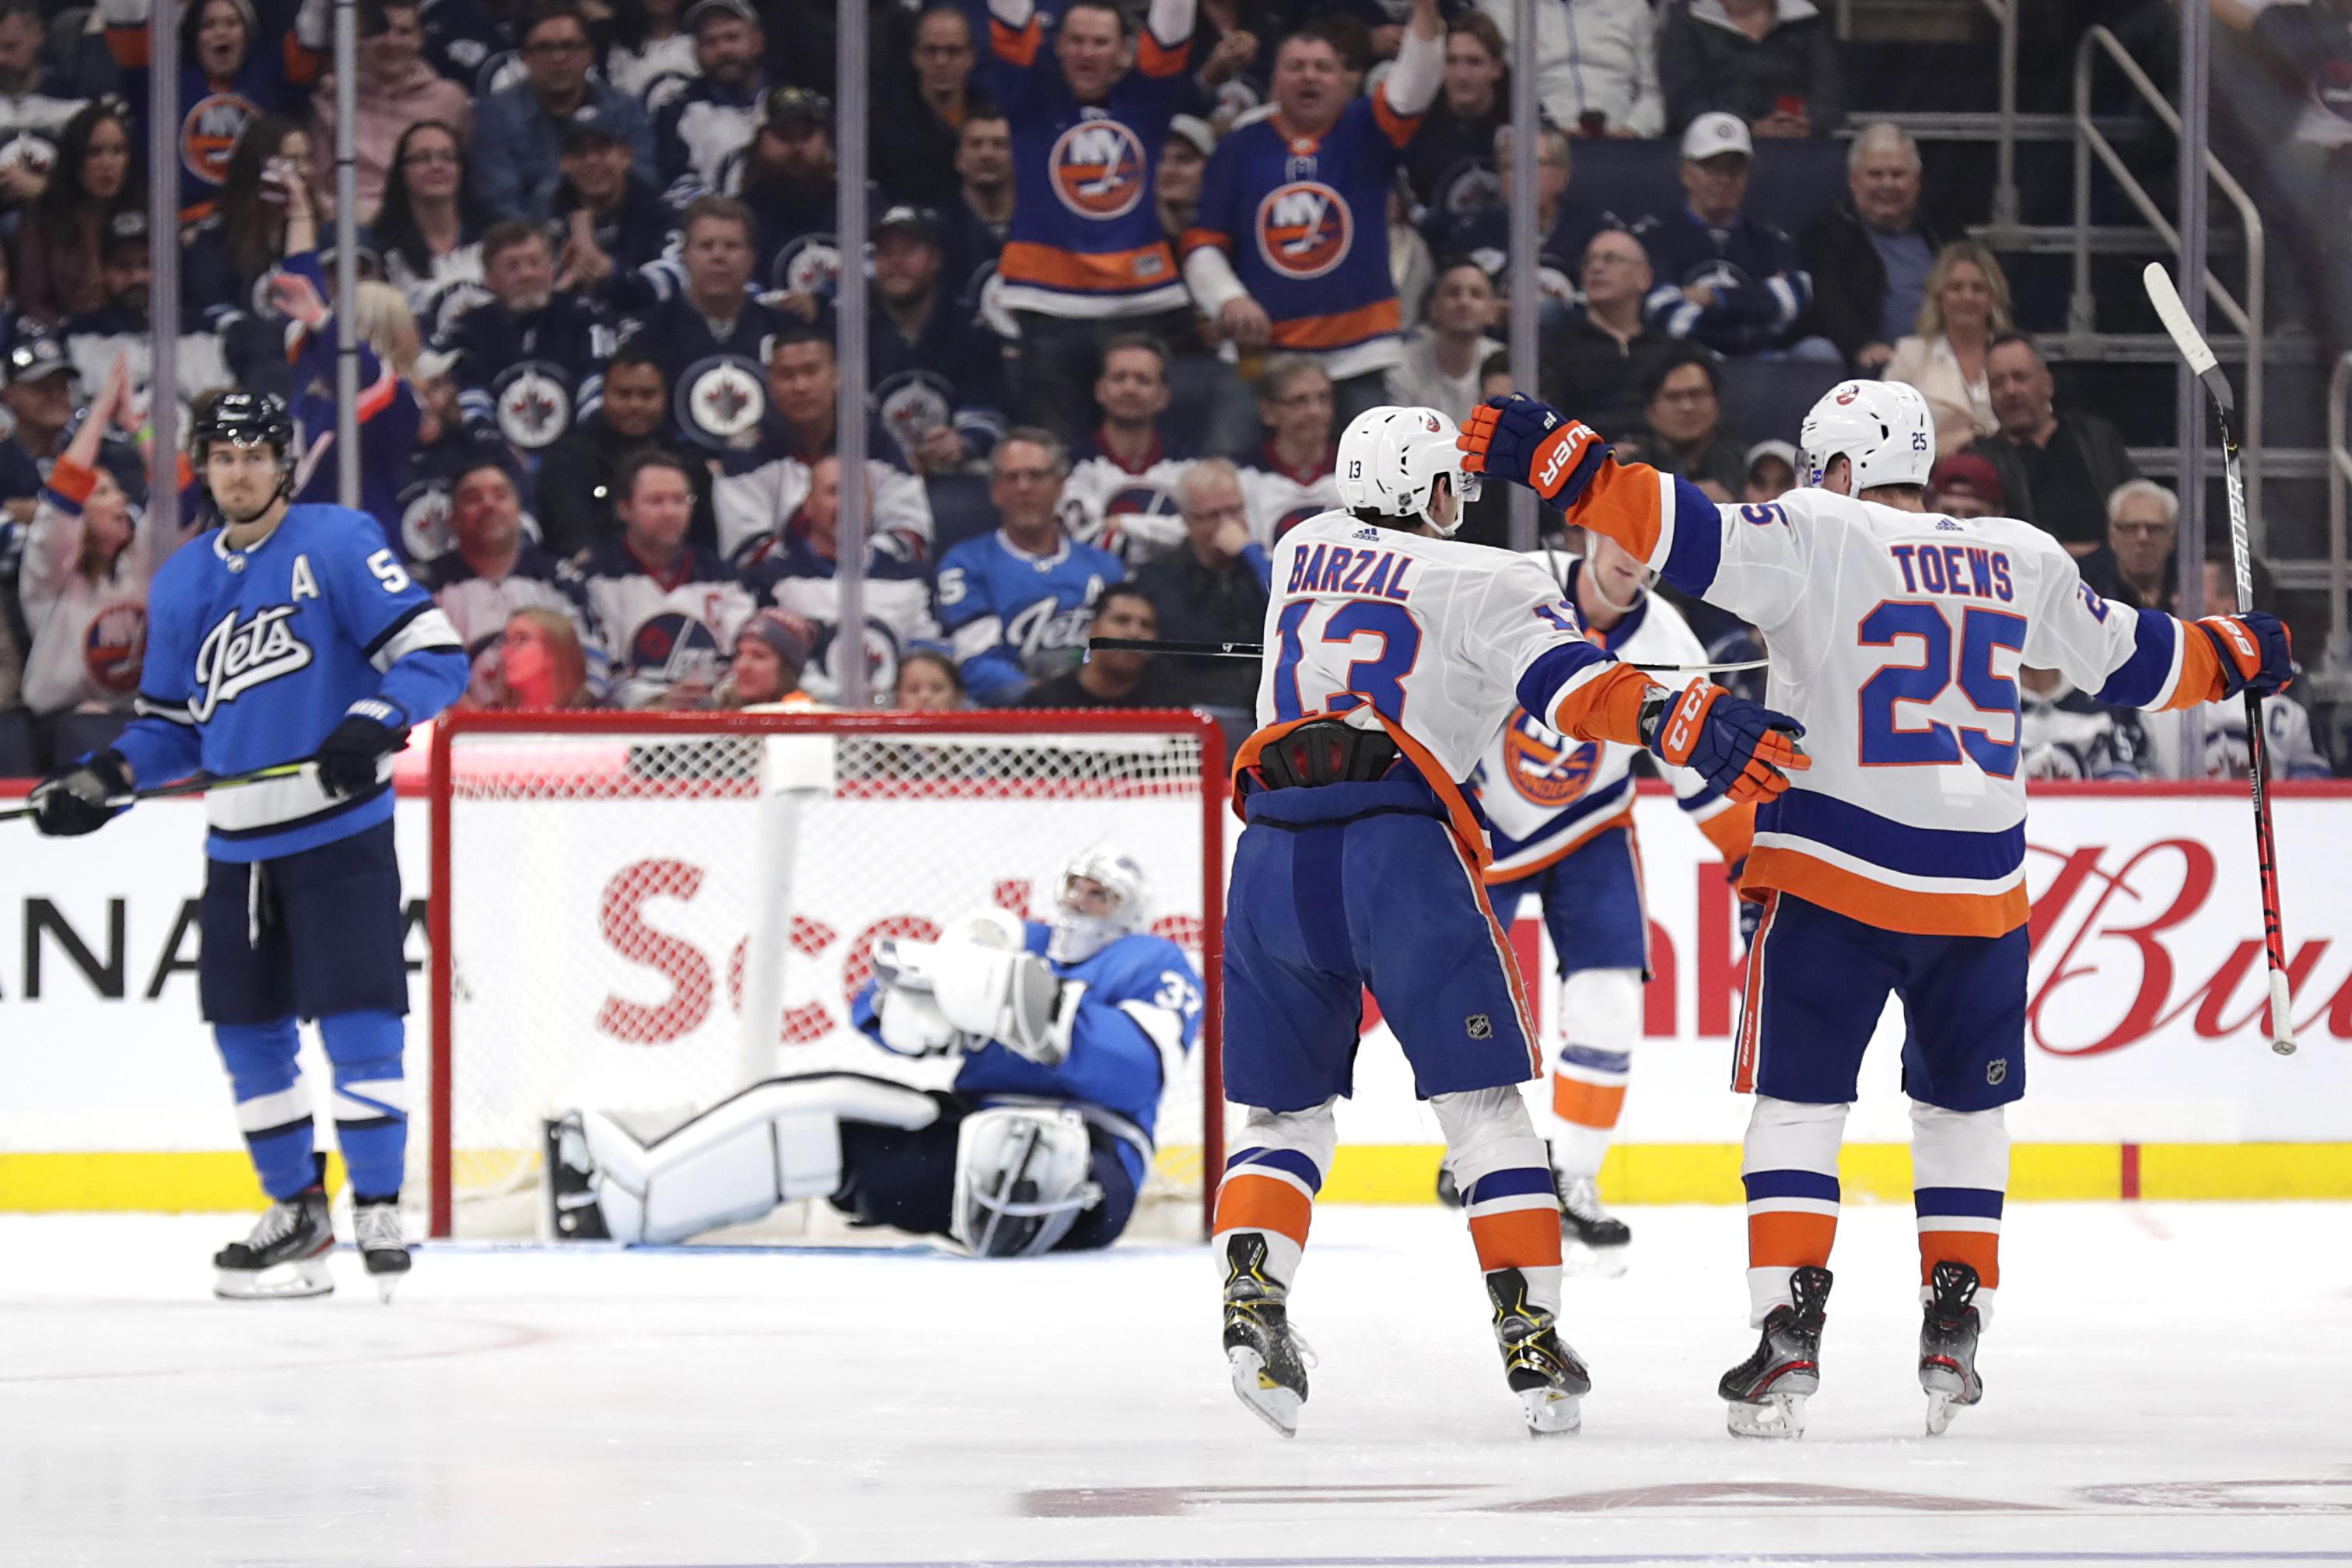 Pantorno's Point: Islanders power play looking up under Hiller